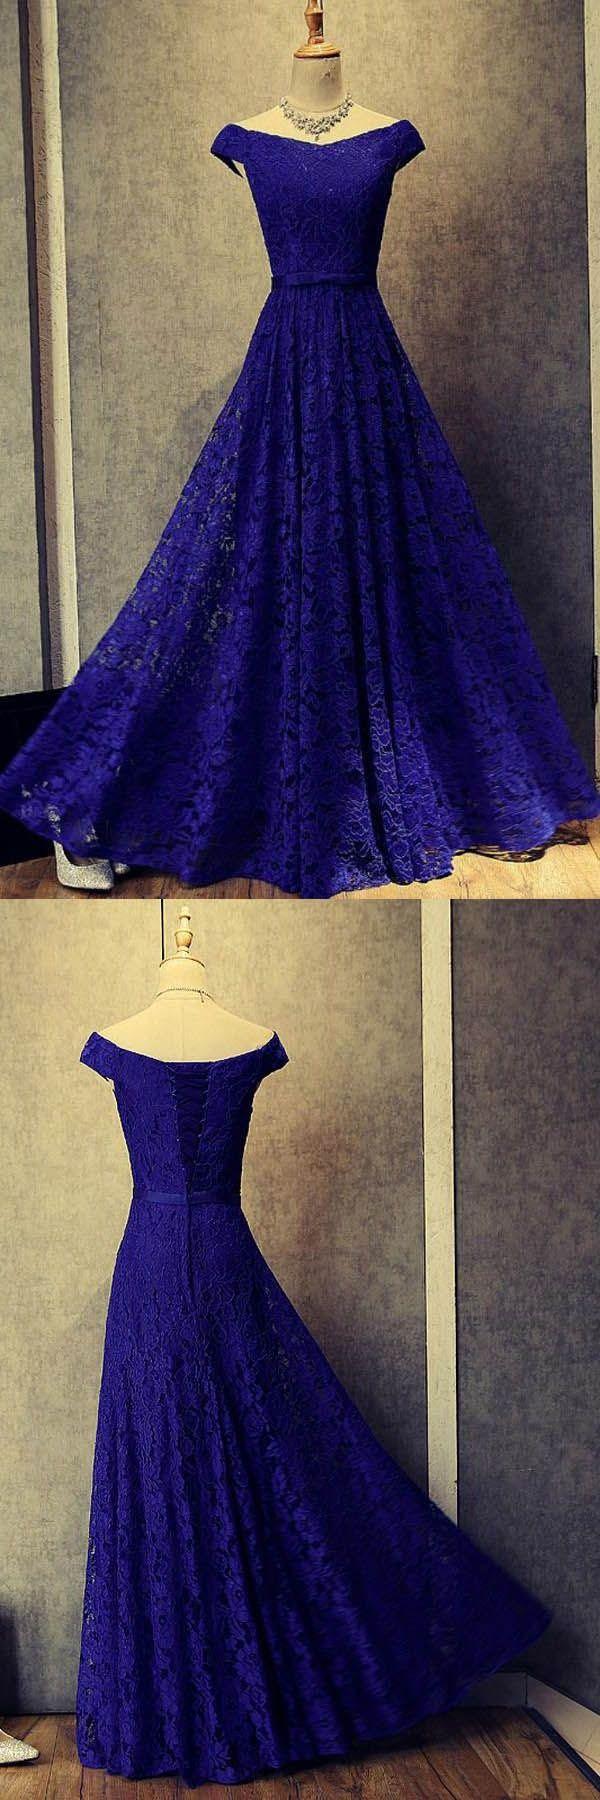 prom dresses promdresses blue prom dresses